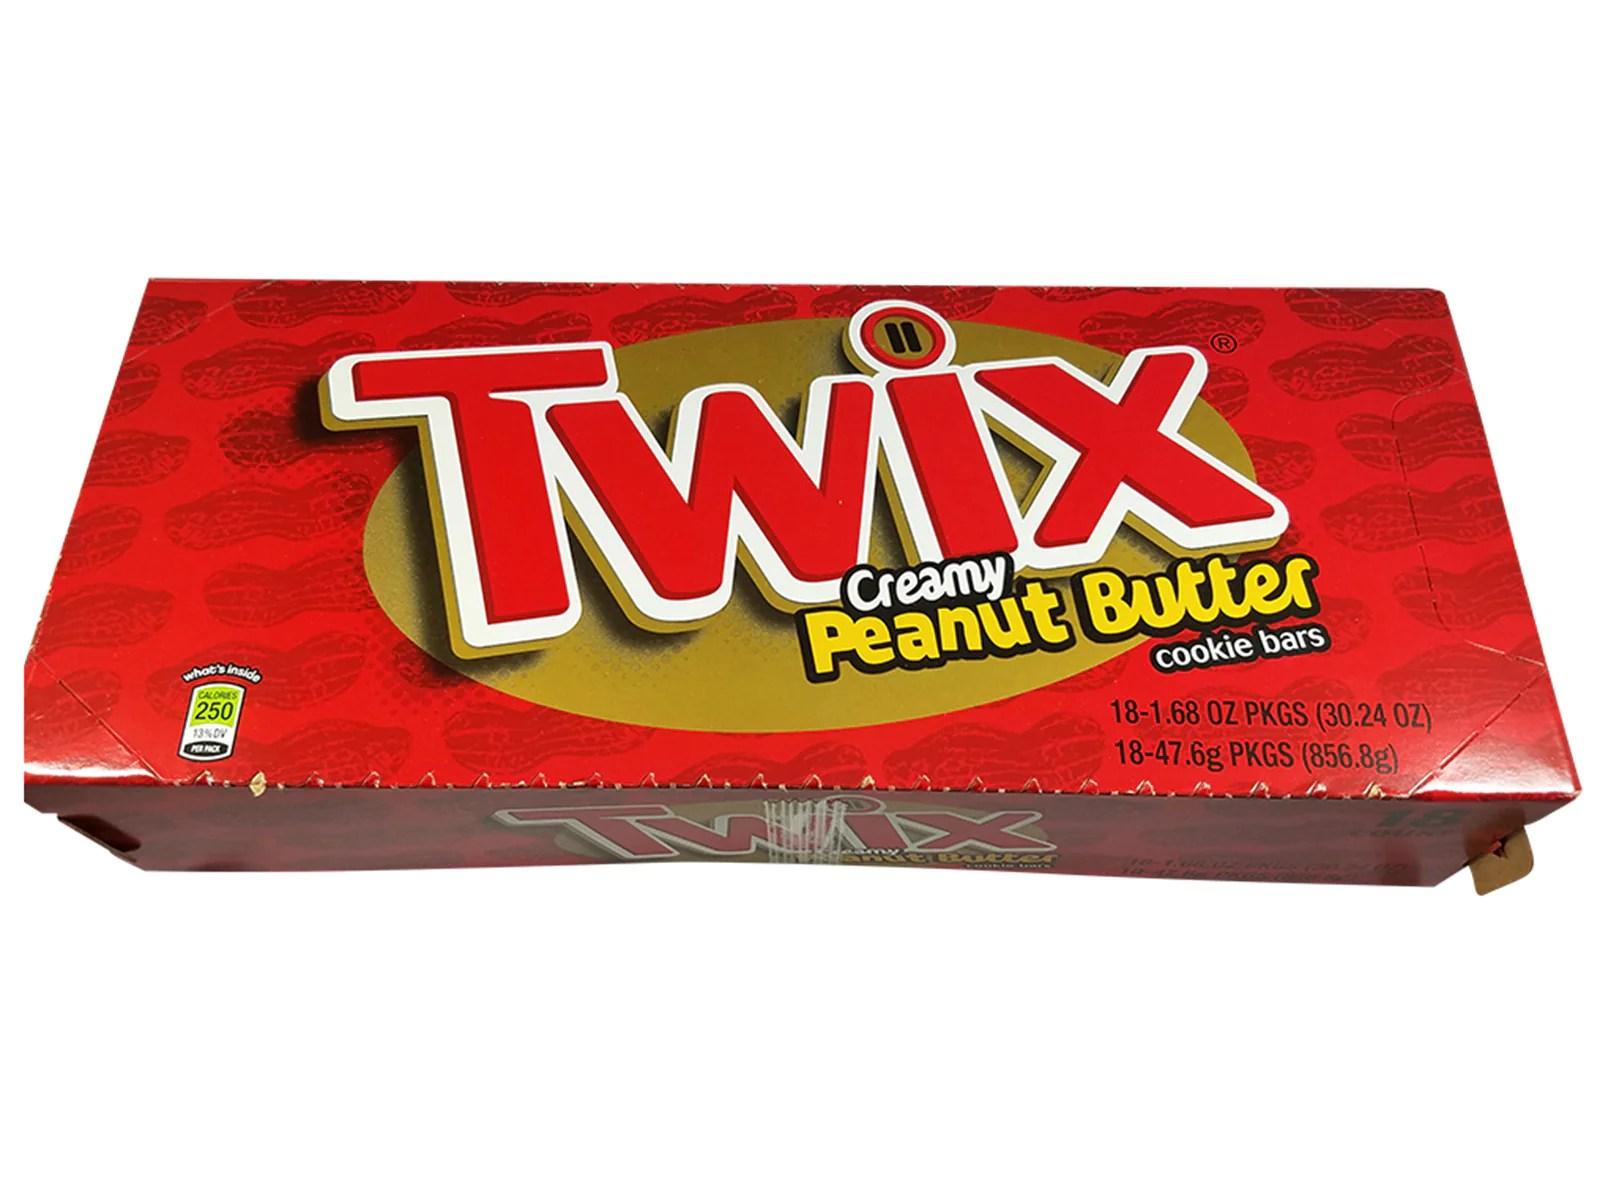 Distinctive Mrcandyshop Twix Creamy Peanut Butter Cookie Bars Singles Size Bar Peanut Butter Twix Uk Peanut Butter Twix Nutrition Facts nice food Peanut Butter Twix